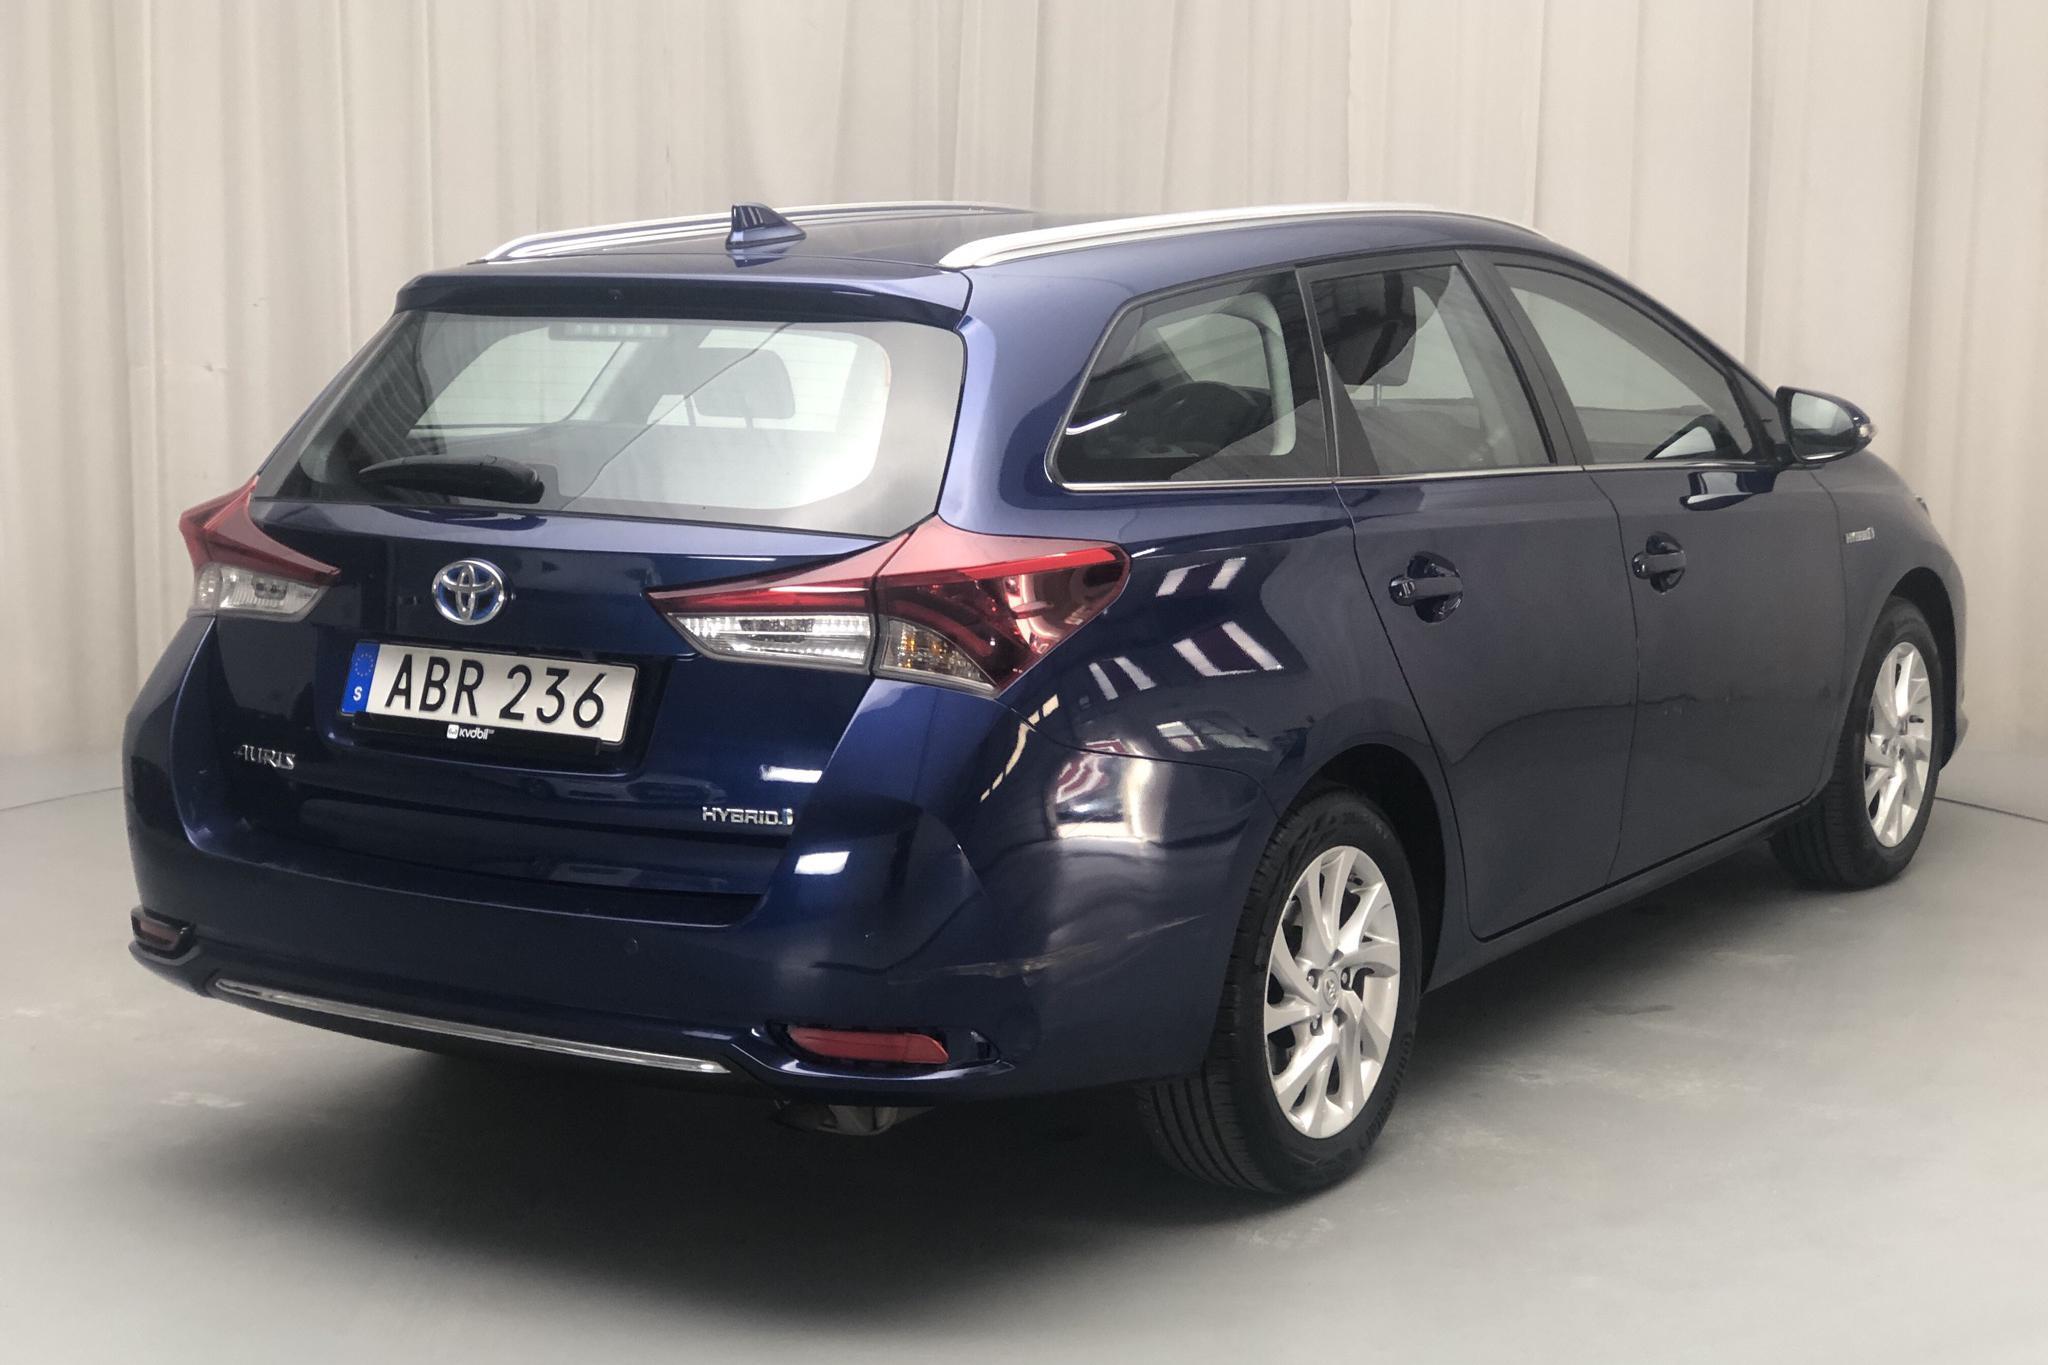 Toyota Auris 1.8 HSD Touring Sports (99hk) - 67 930 km - Automatic - Dark Blue - 2017